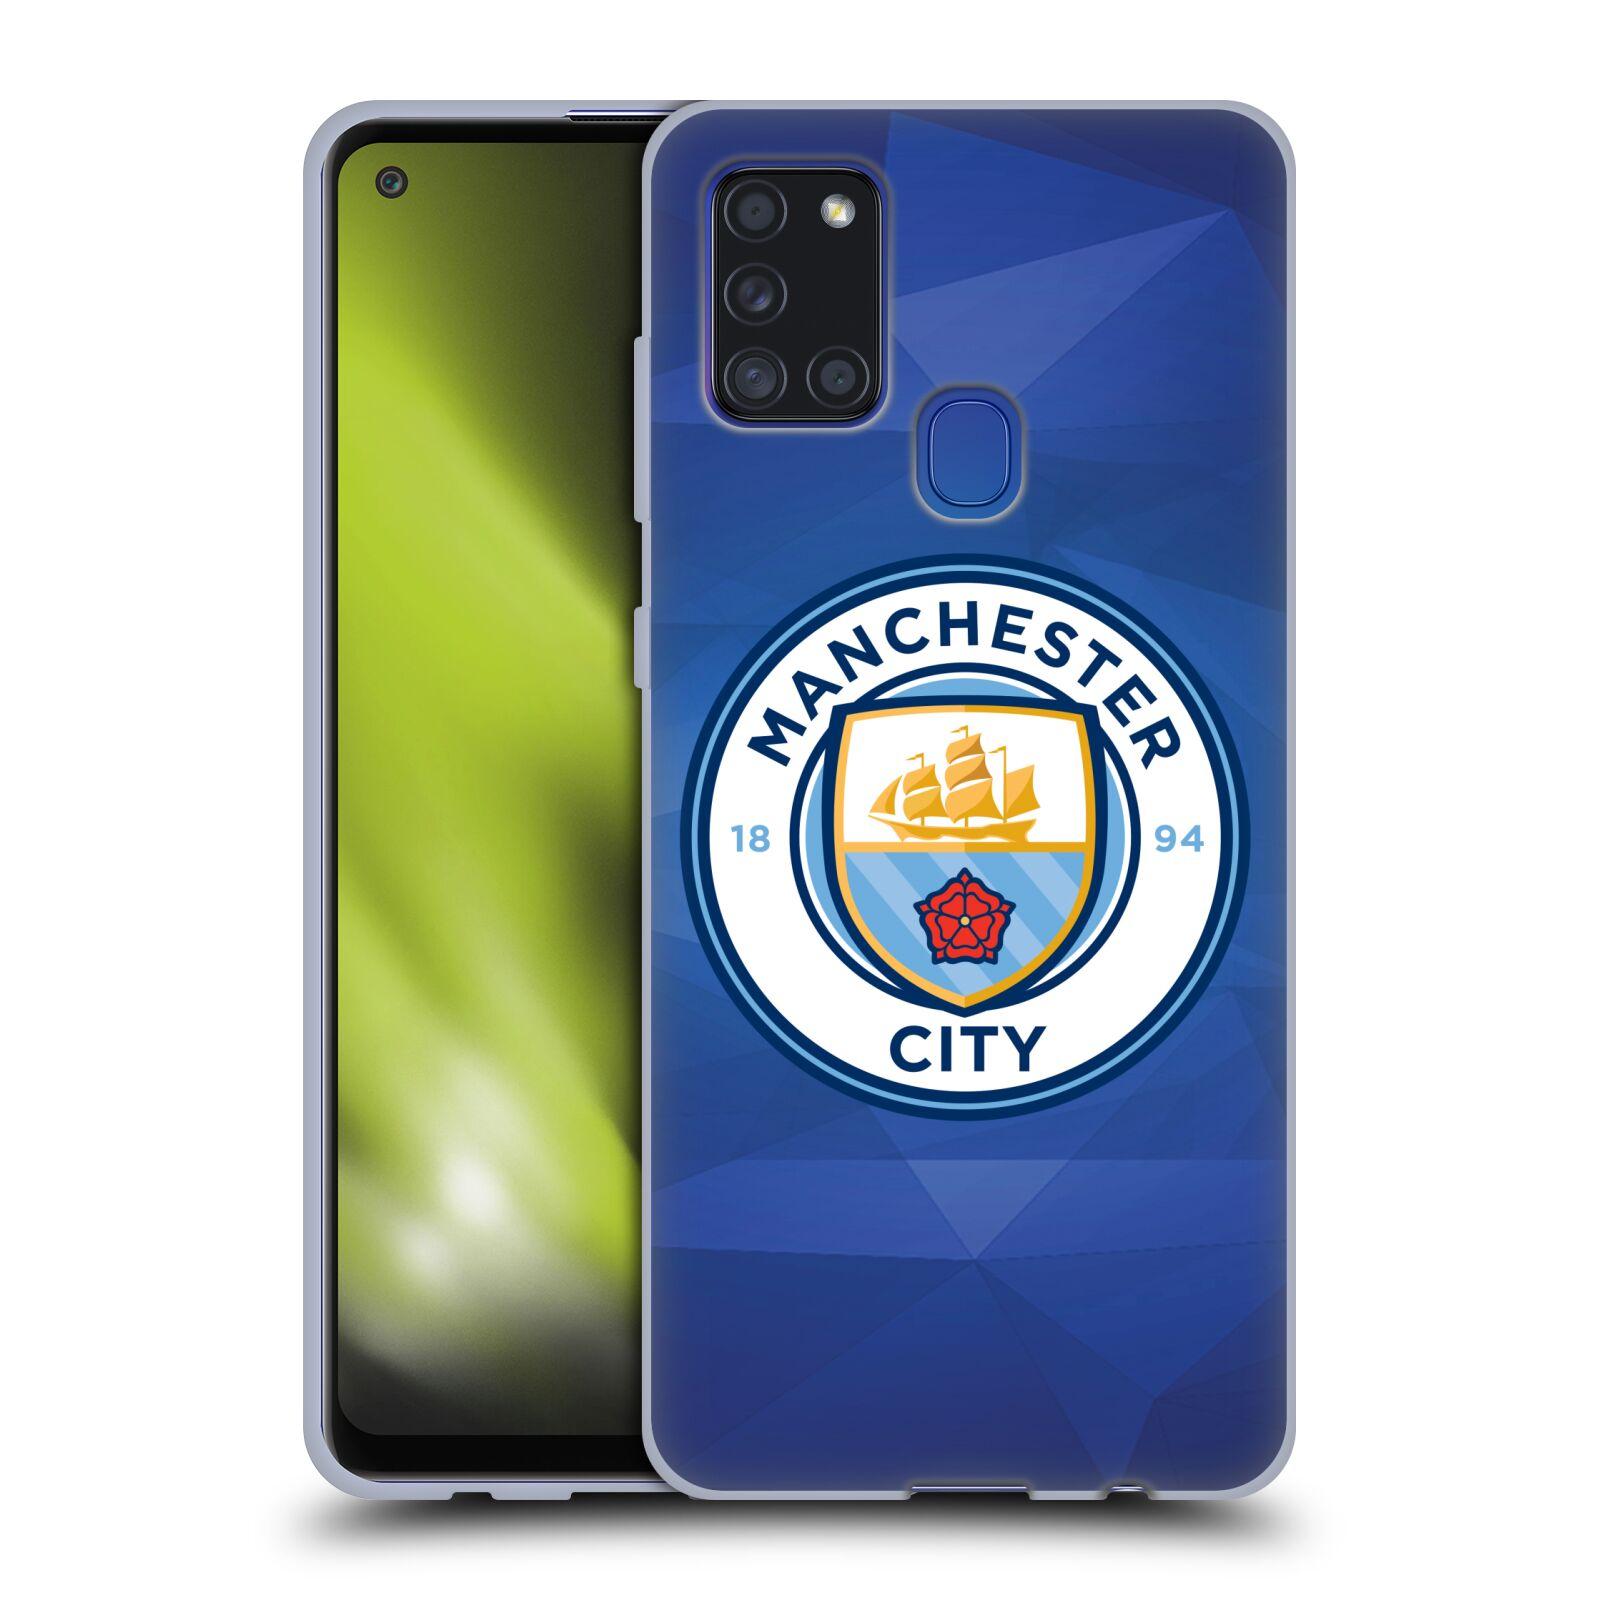 Silikonové pouzdro na mobil Samsung Galaxy A21s - Head Case - Manchester City FC - Modré nové logo